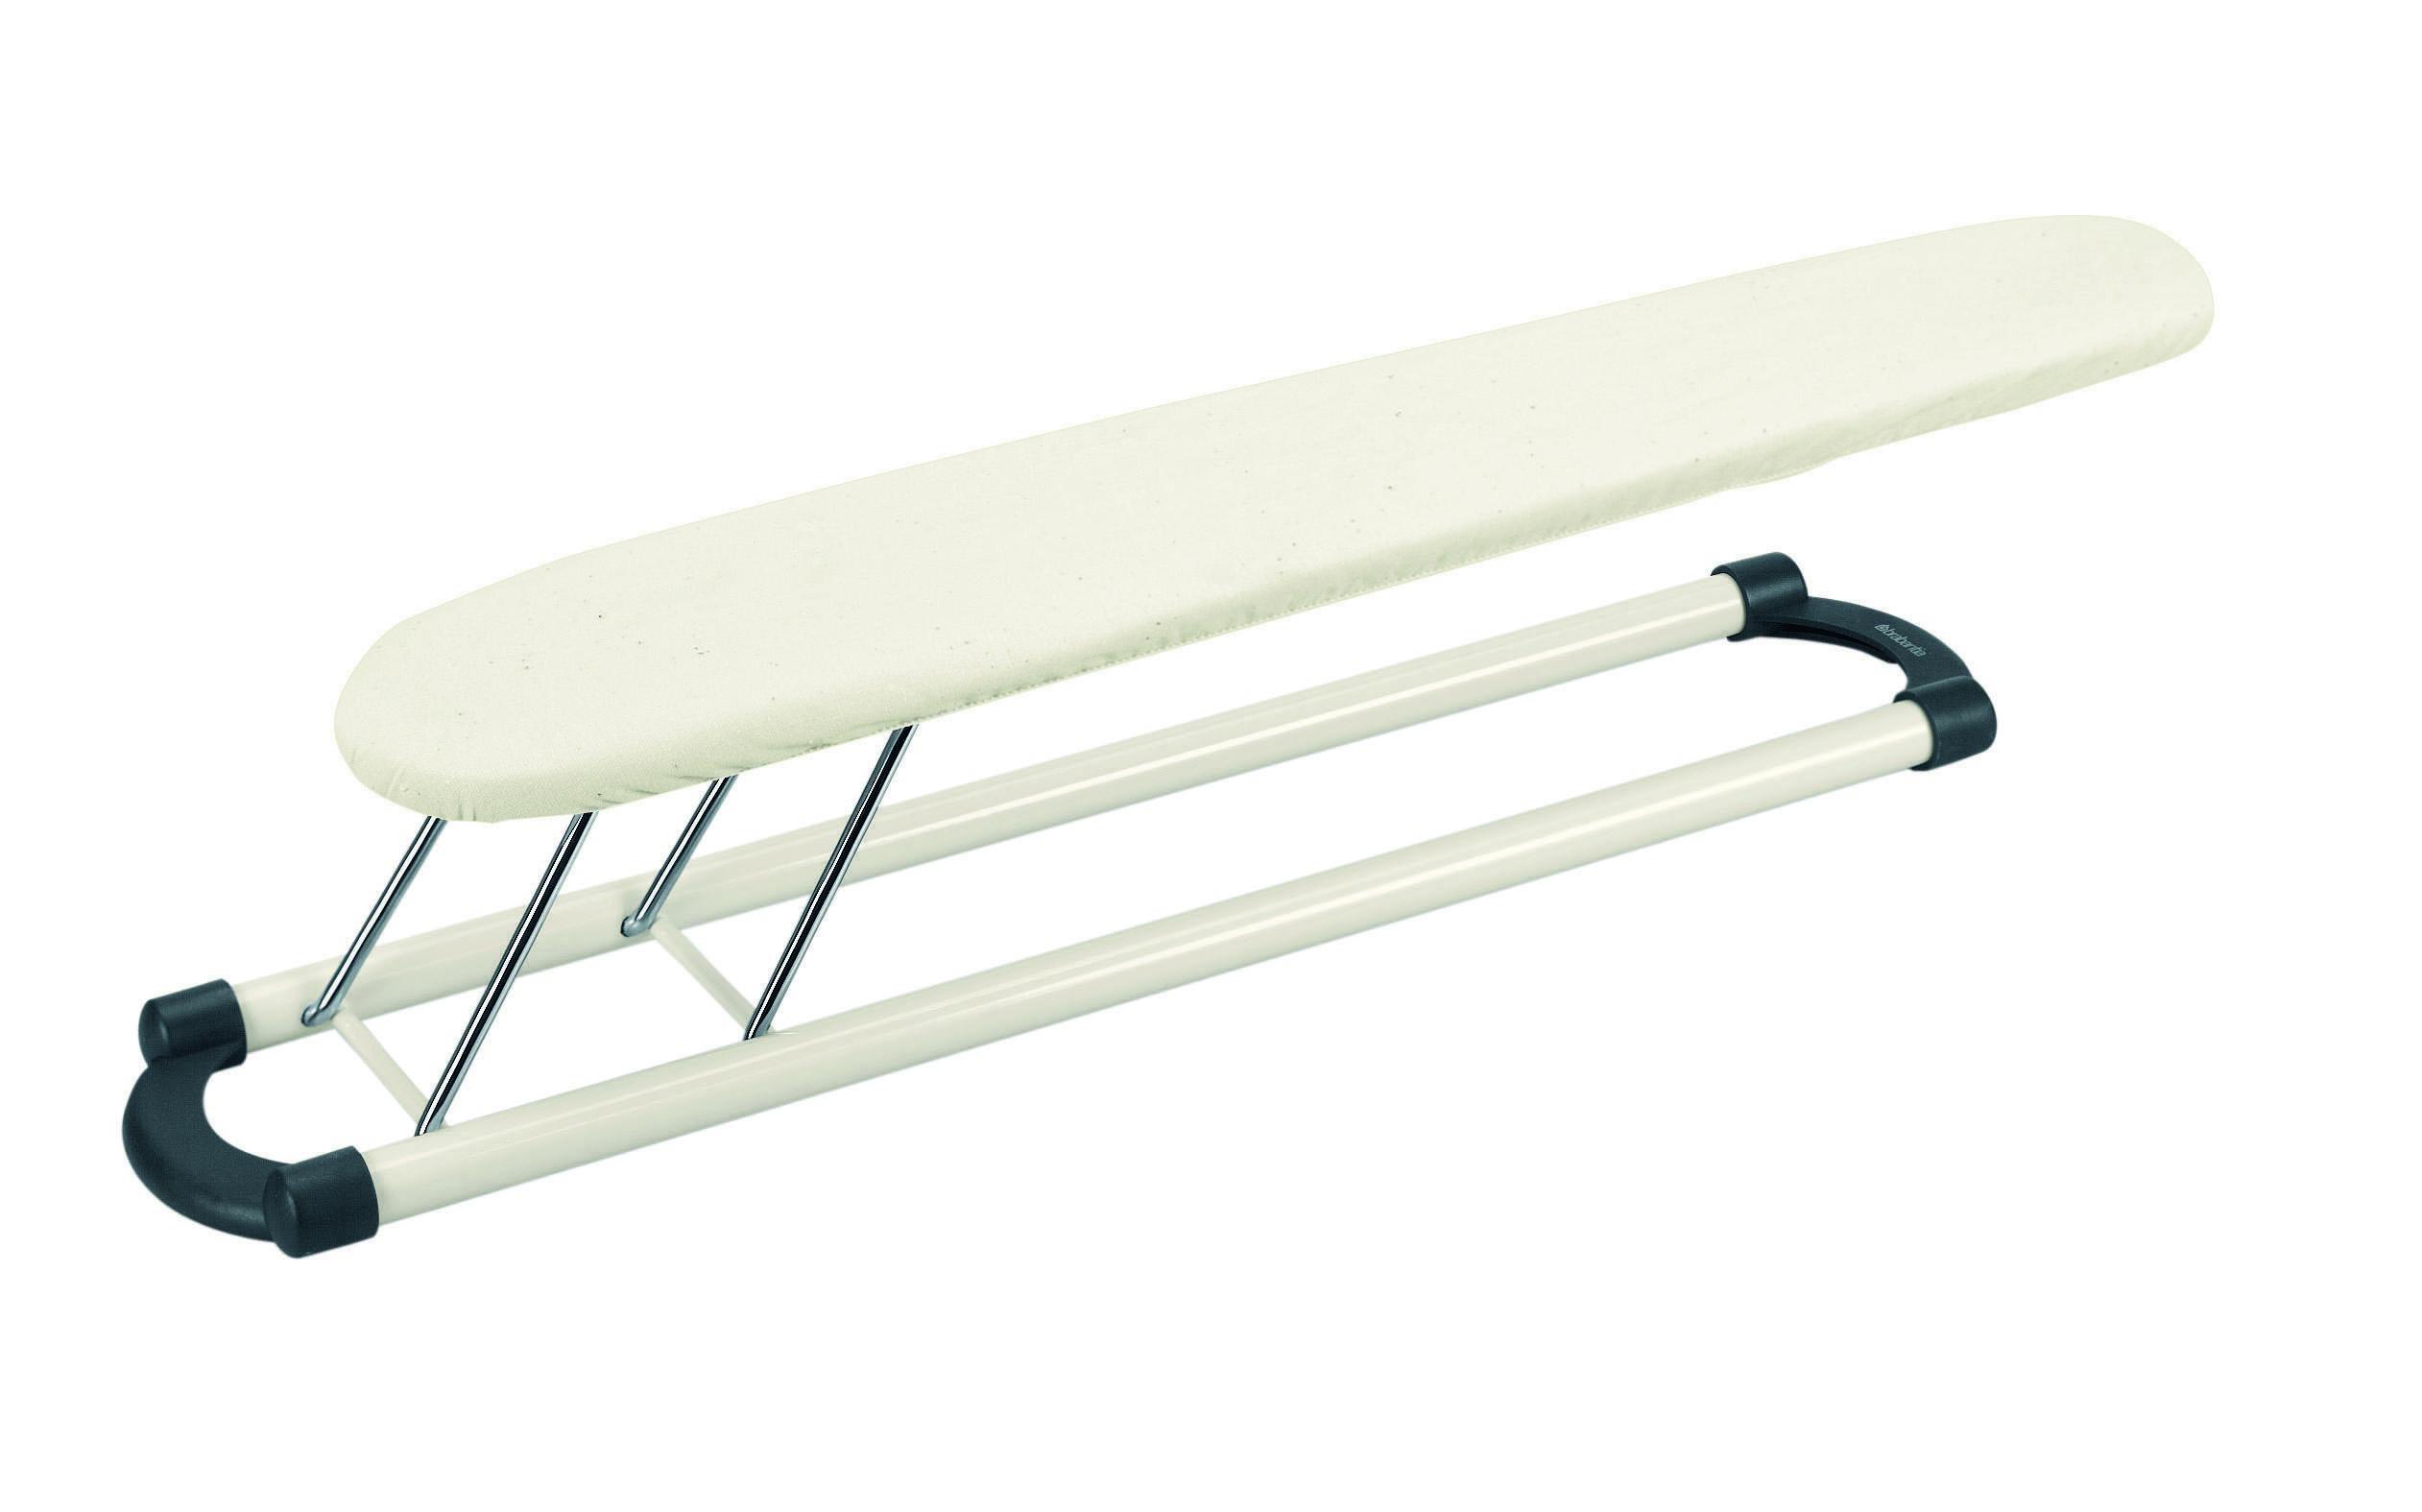 BRABANTIA pamatne piedurkņu gludināšanai, 60x10 cm, Ecru / White Frame (371806) 102400